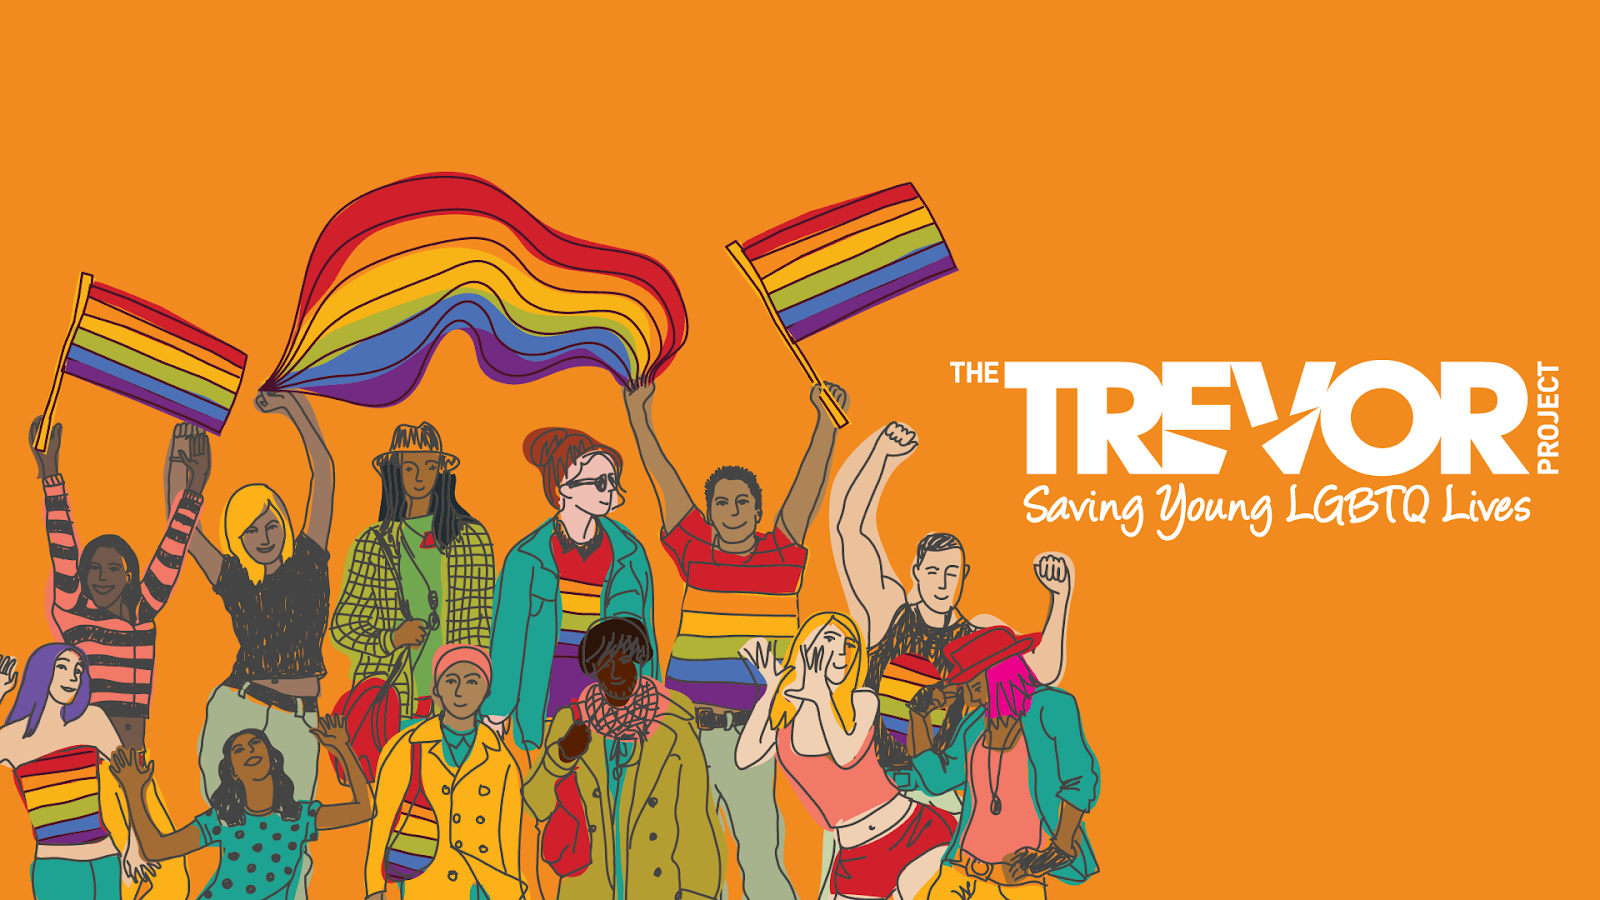 Illustration for the Trevor Project